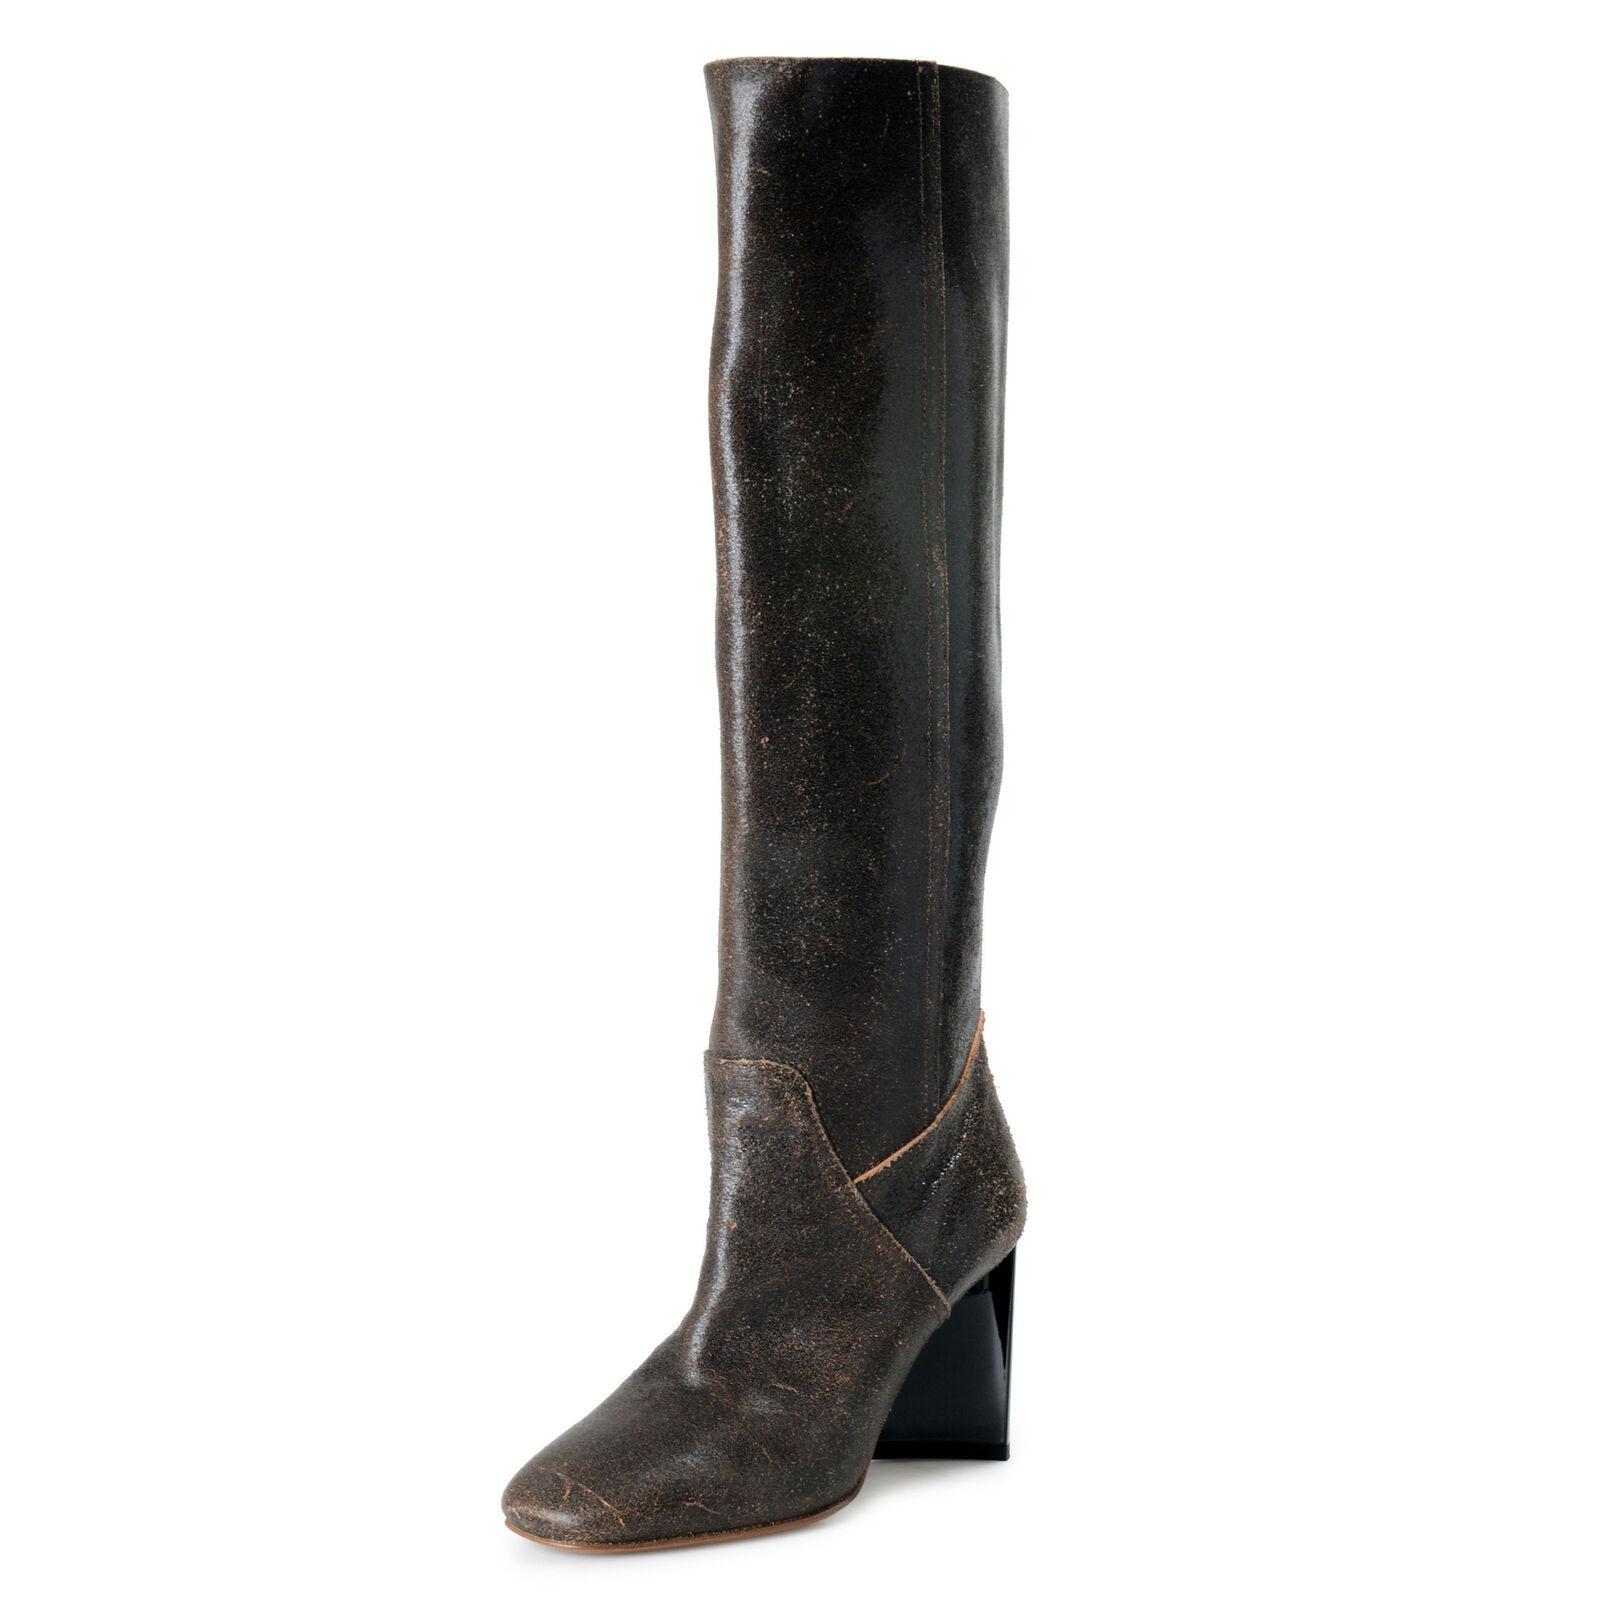 Schuhe Stiefel Absatz Hoher Damen 22 Margiela Maison US